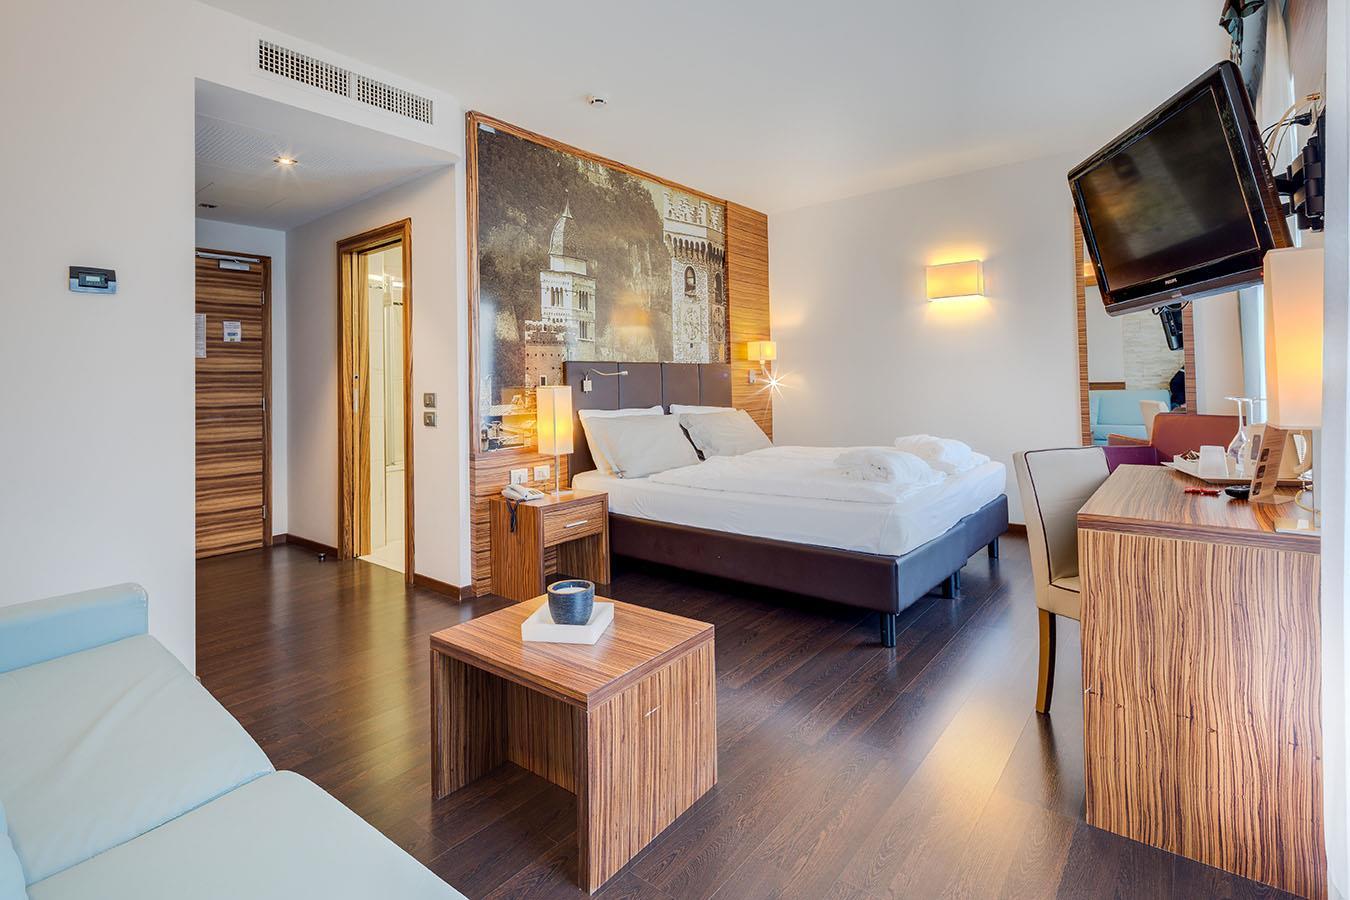 BW Hotel Adige Trento: prenota online | Best Western